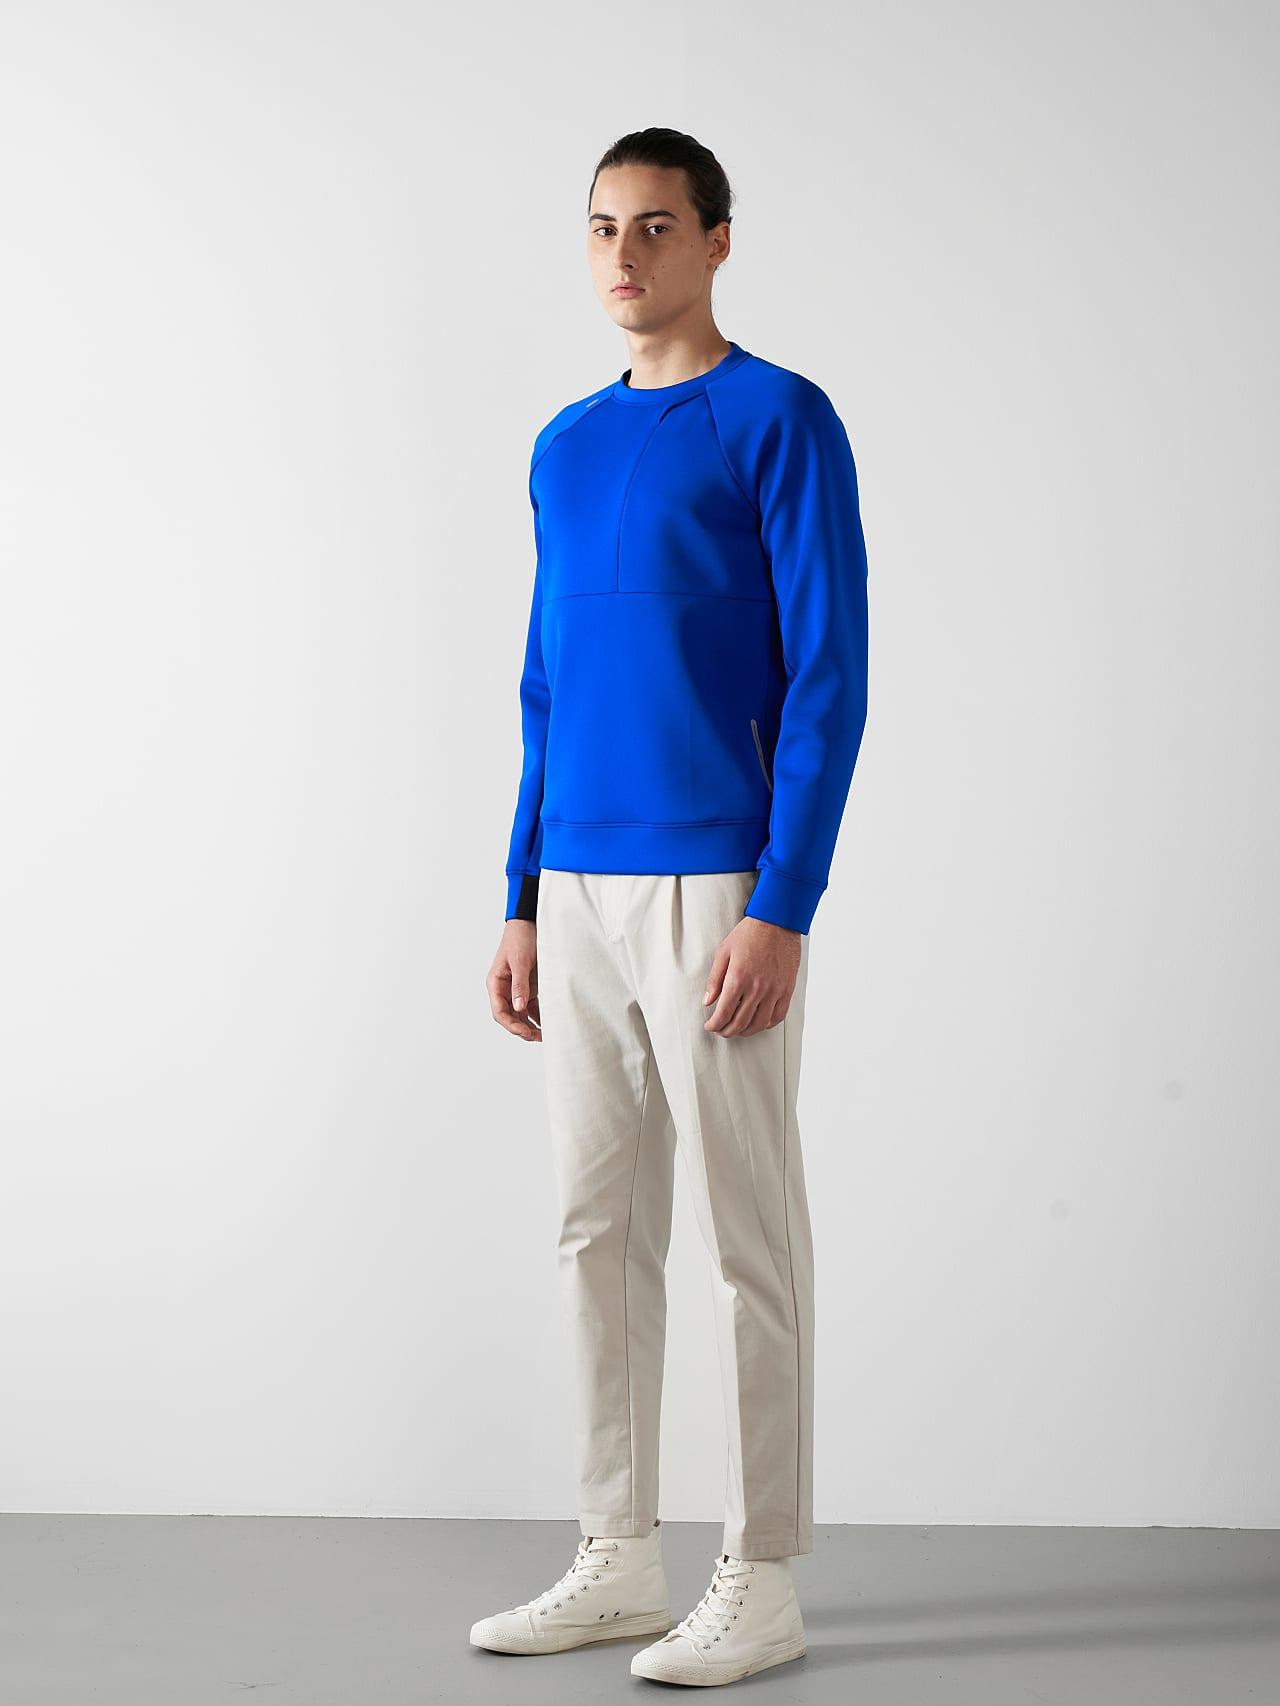 SUPRA V3.Y5.01 Technical Crewneck Sweater blue Front Alpha Tauri